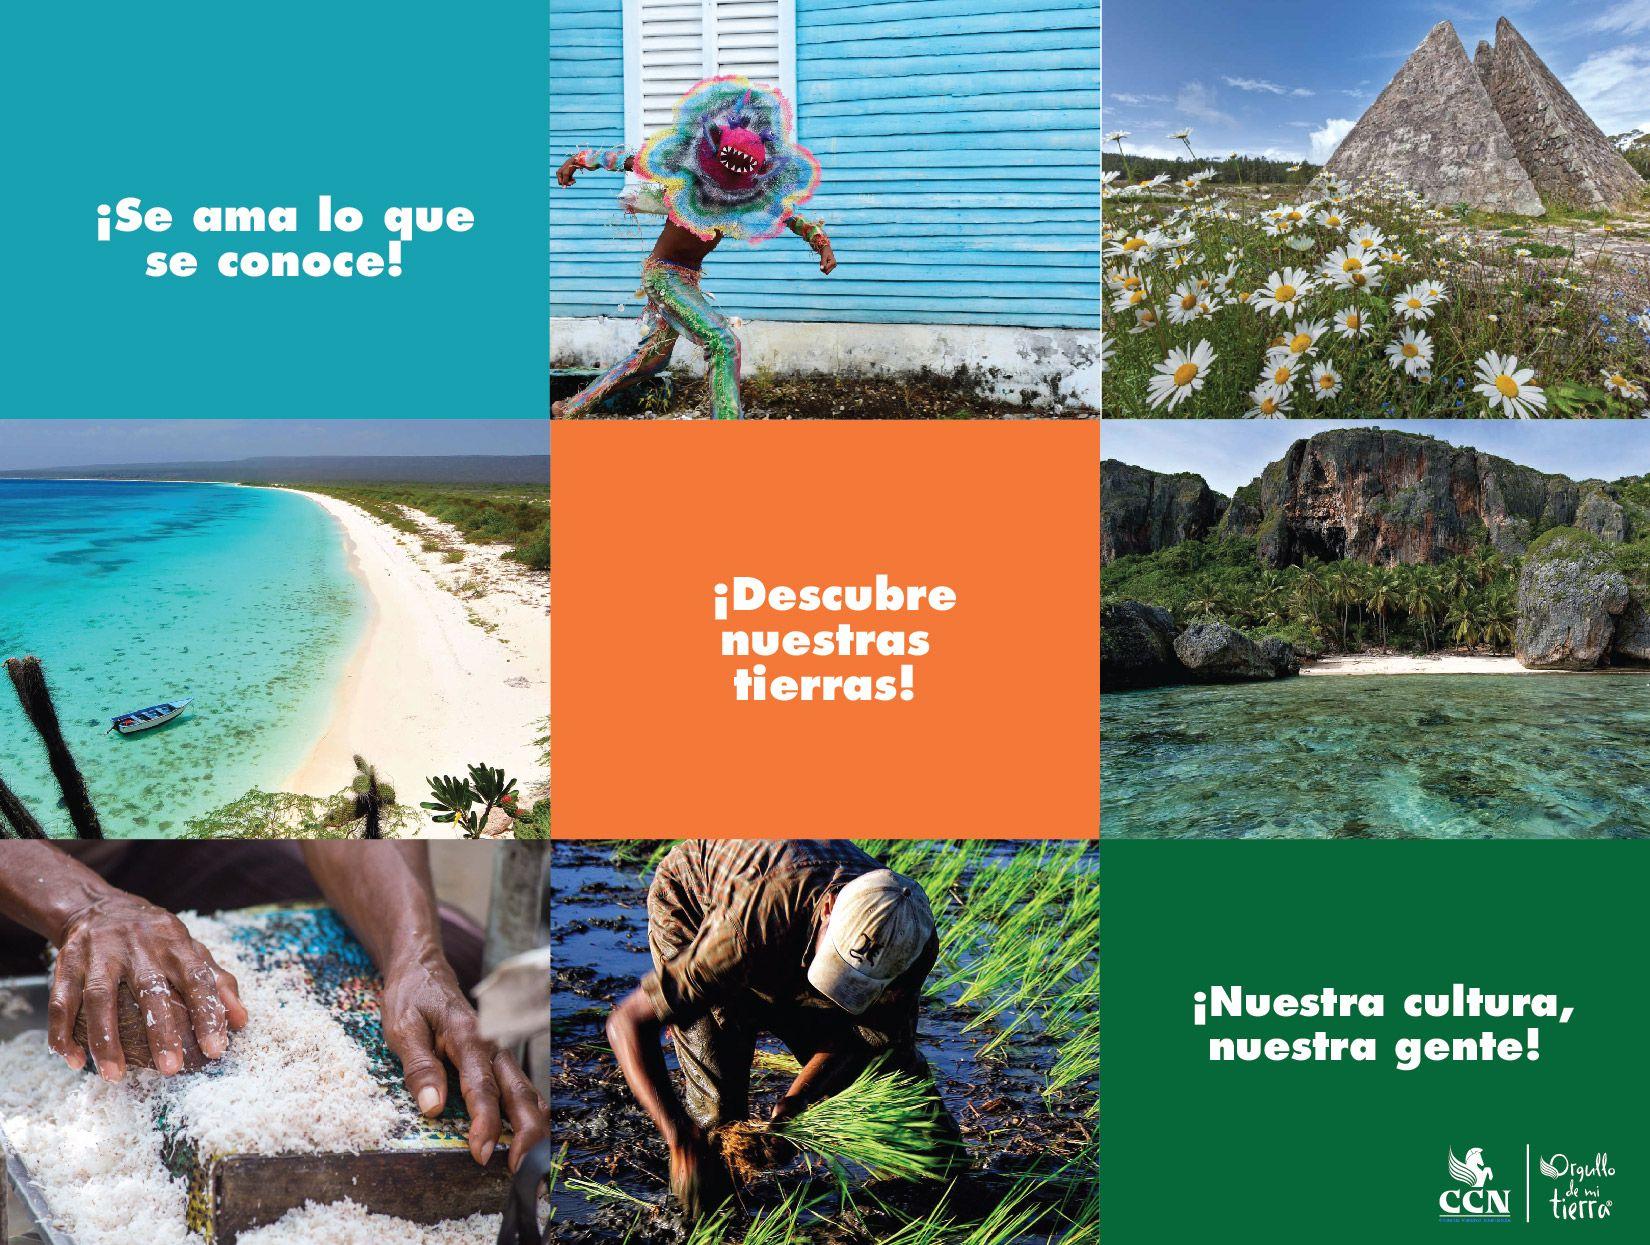 <p><strong><em>Documentales &ldquo;Orgullo de Mi Tierra&rdquo; de Centro Cuesta Nacional&nbsp; ahora disponibles en plataforma de cine dominicano Pelidom</em></strong></p>